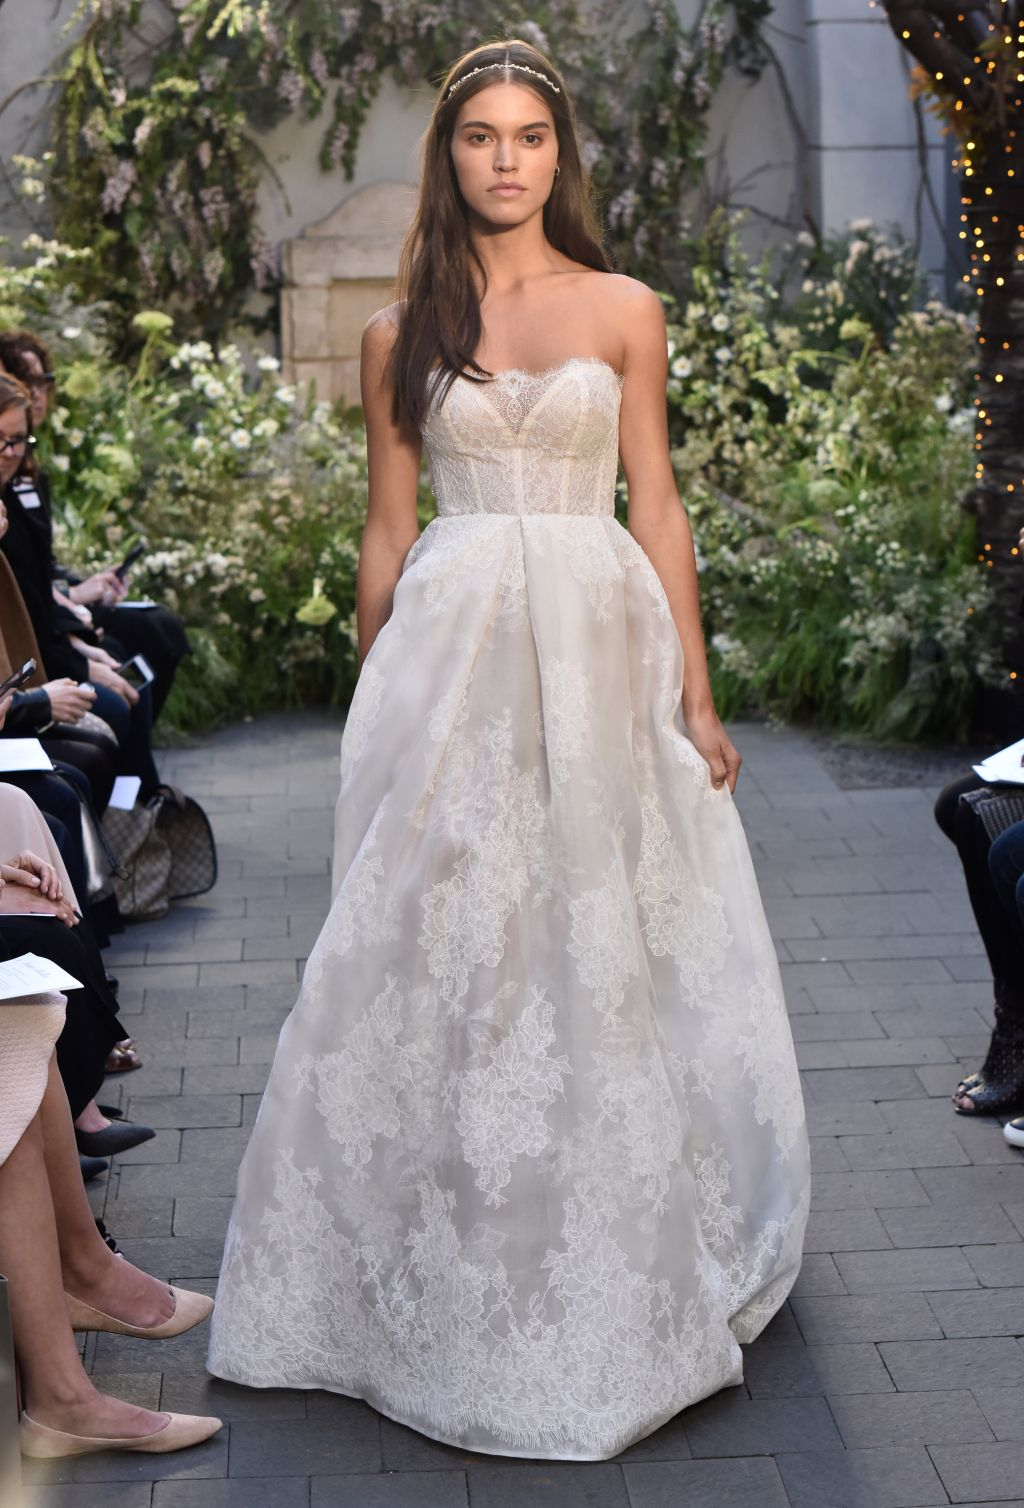 Monique Lhuillier Bridal Spring 2017 | #BridalFashionWeek #WeddingDress [Photo: Rodin Banica]